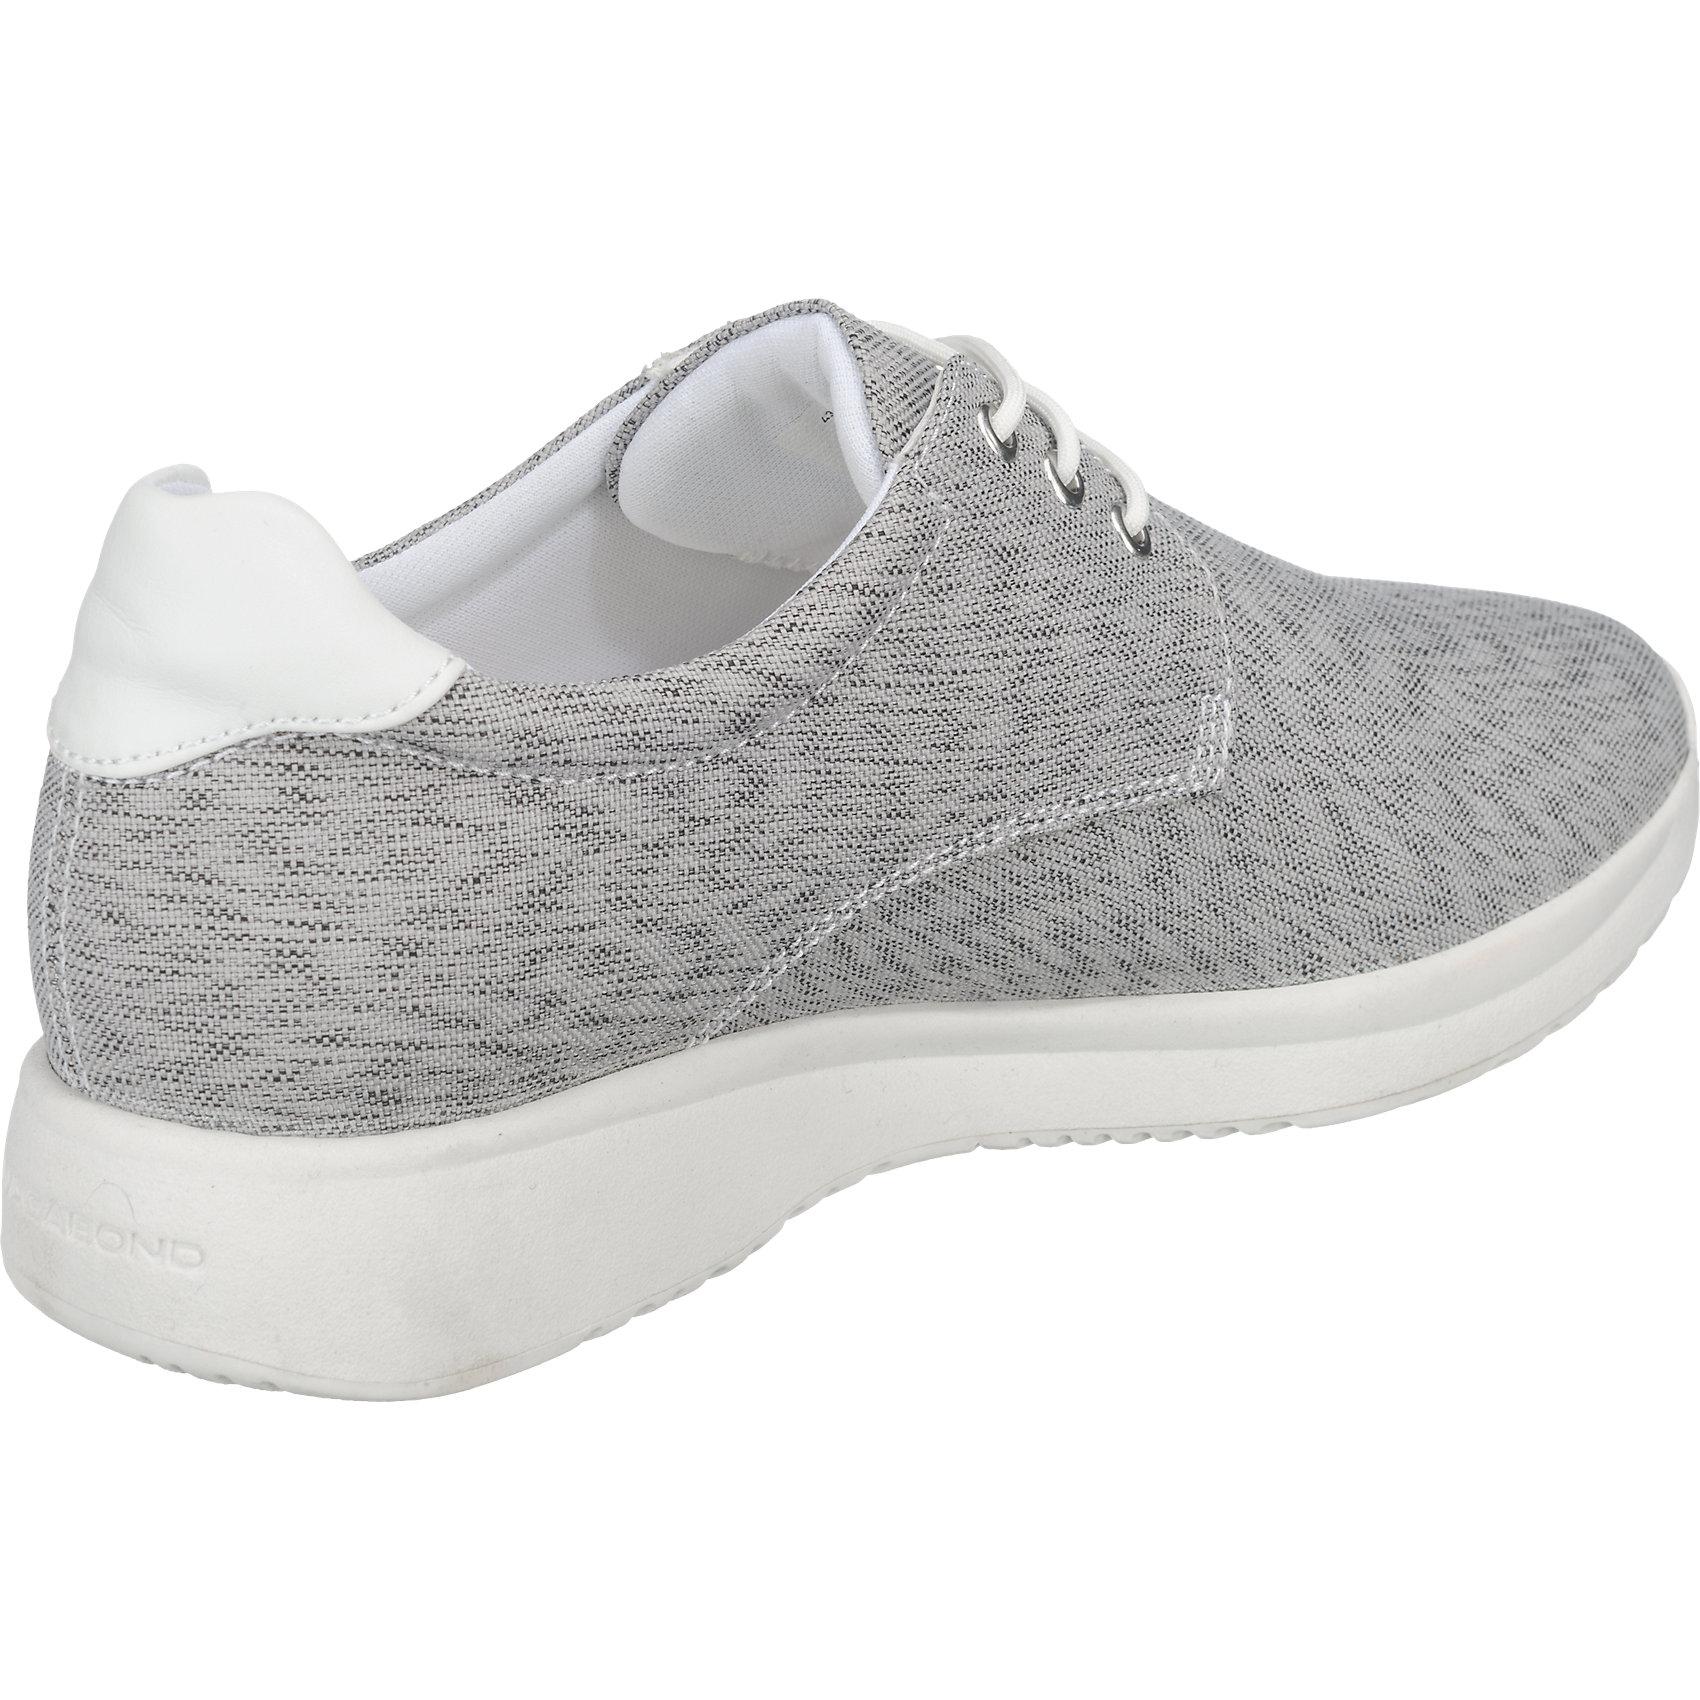 Neu-VAGABOND-Cintia-Sneakers-5766885-fuer-Damen-beige-